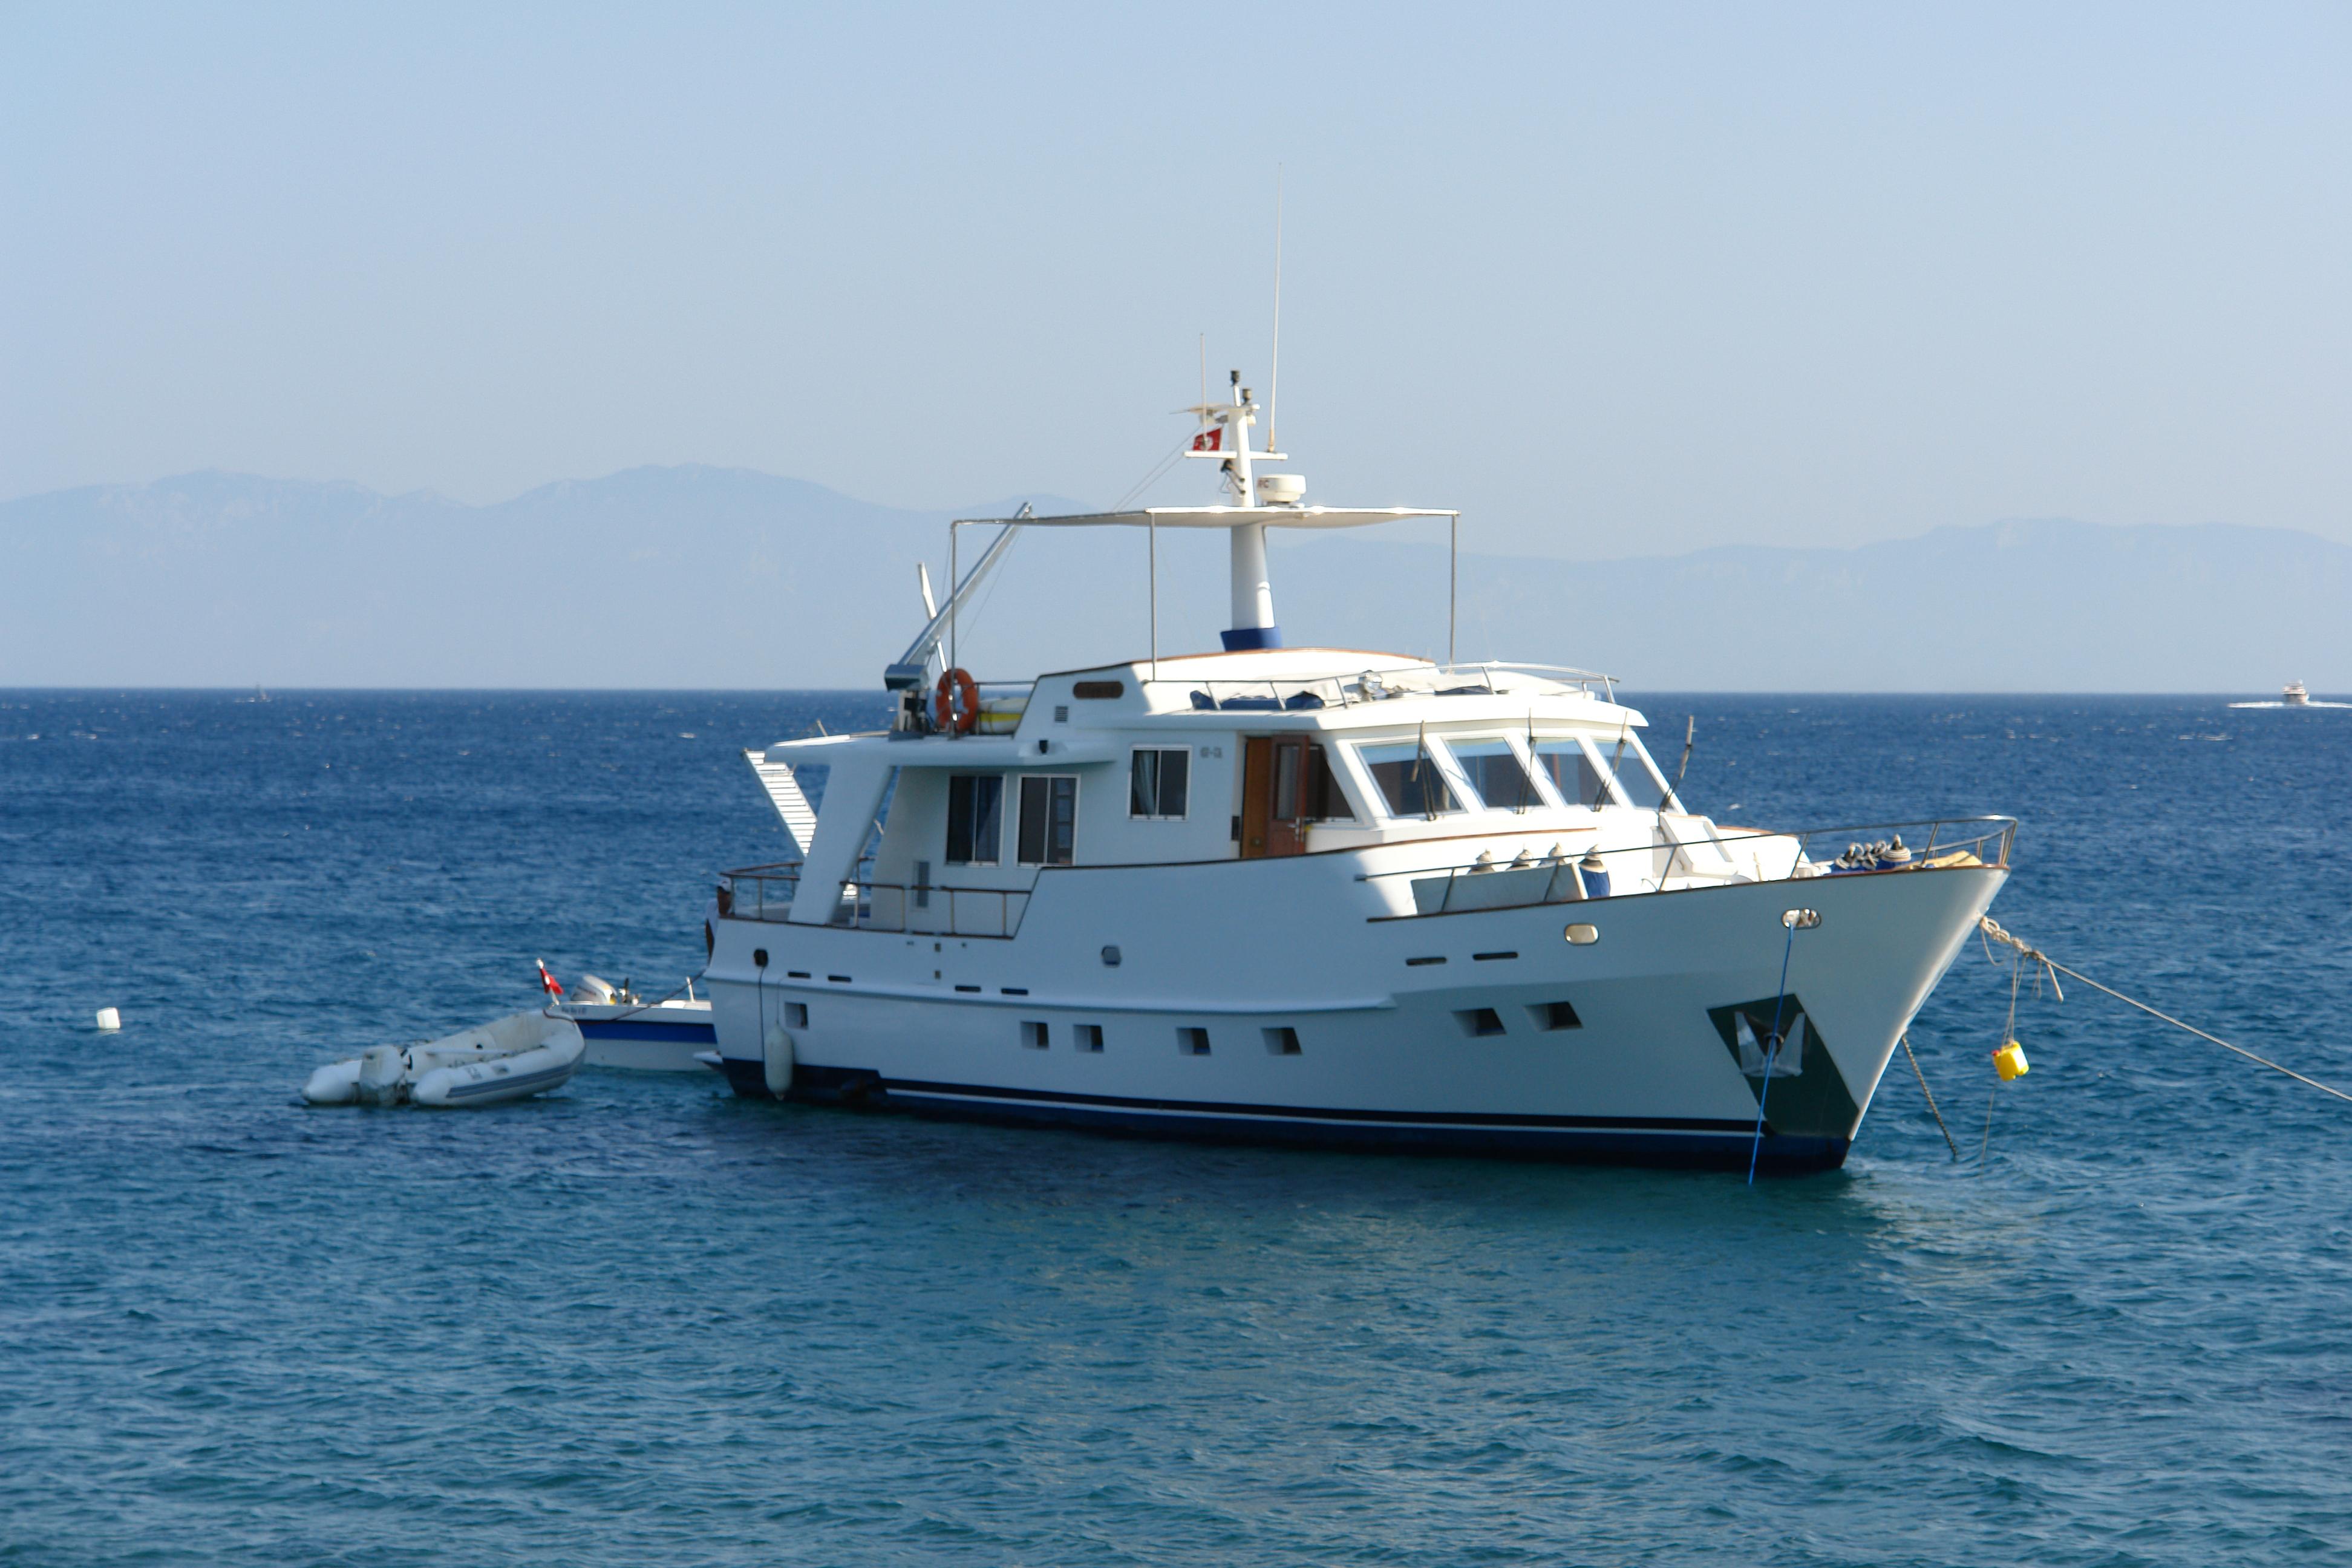 Yacht at sea, Boat, Luxury, Ocean, Sail, HQ Photo